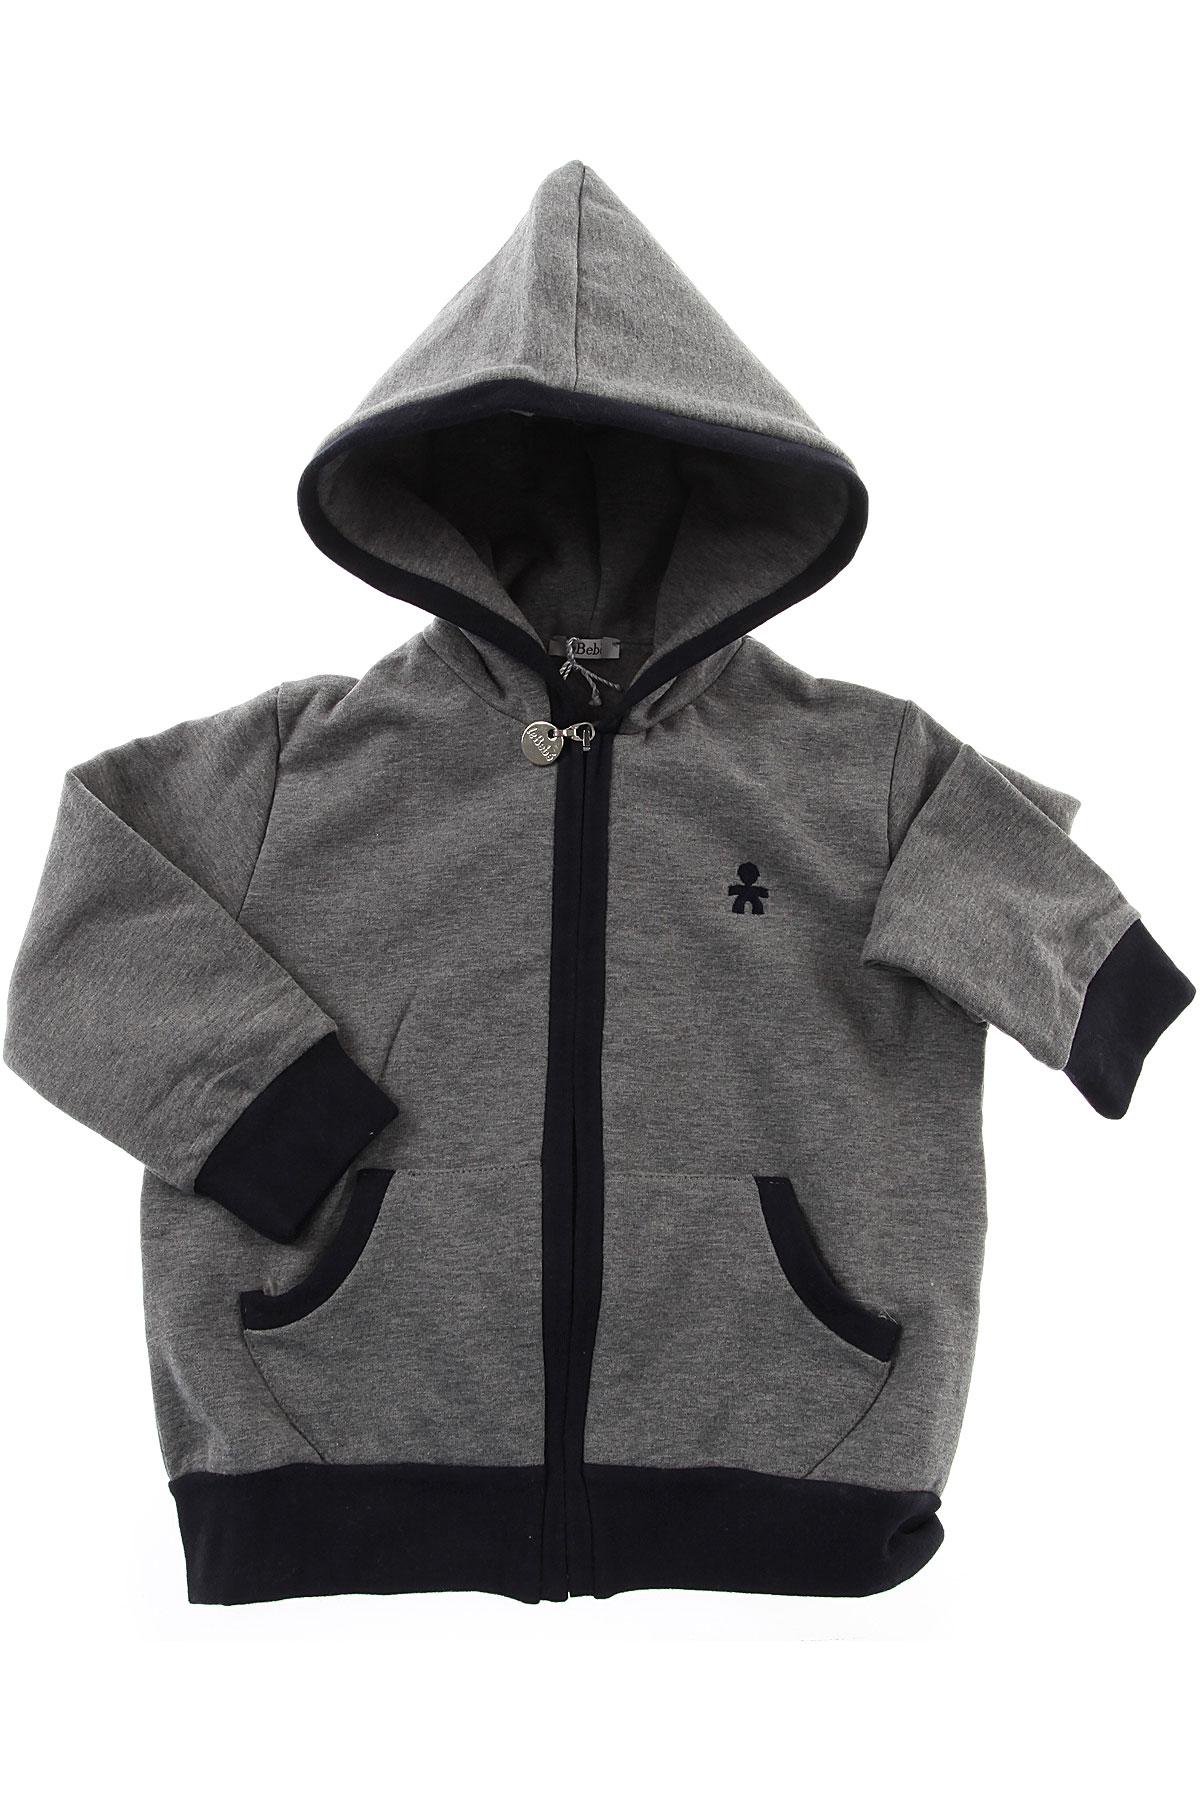 Image of Le Bebe Baby Sweatshirts & Hoodies for Boys, Grey Melange, Cotton, 2017, 12M 18M 6M 9M